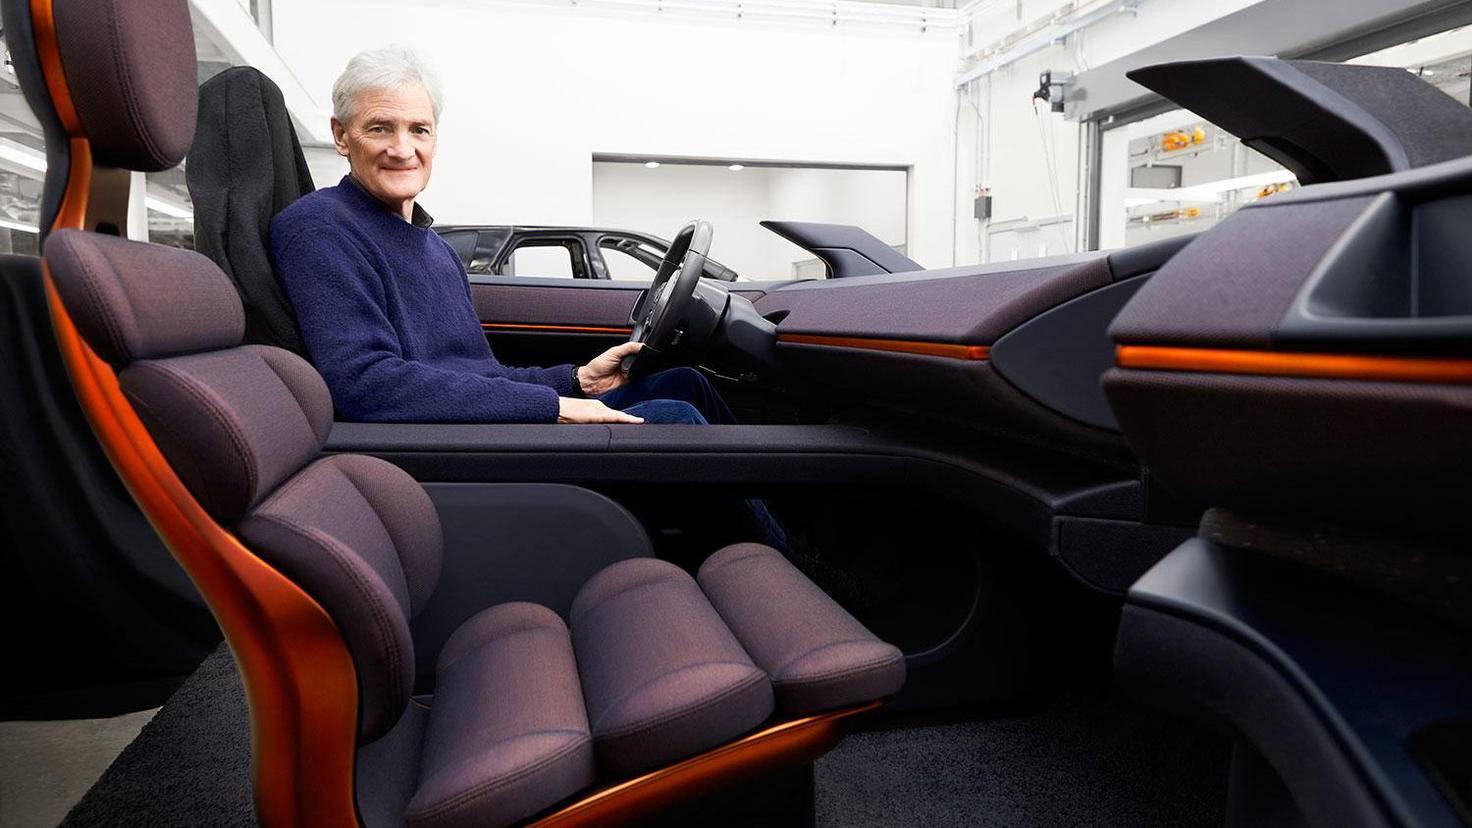 dyson car interior